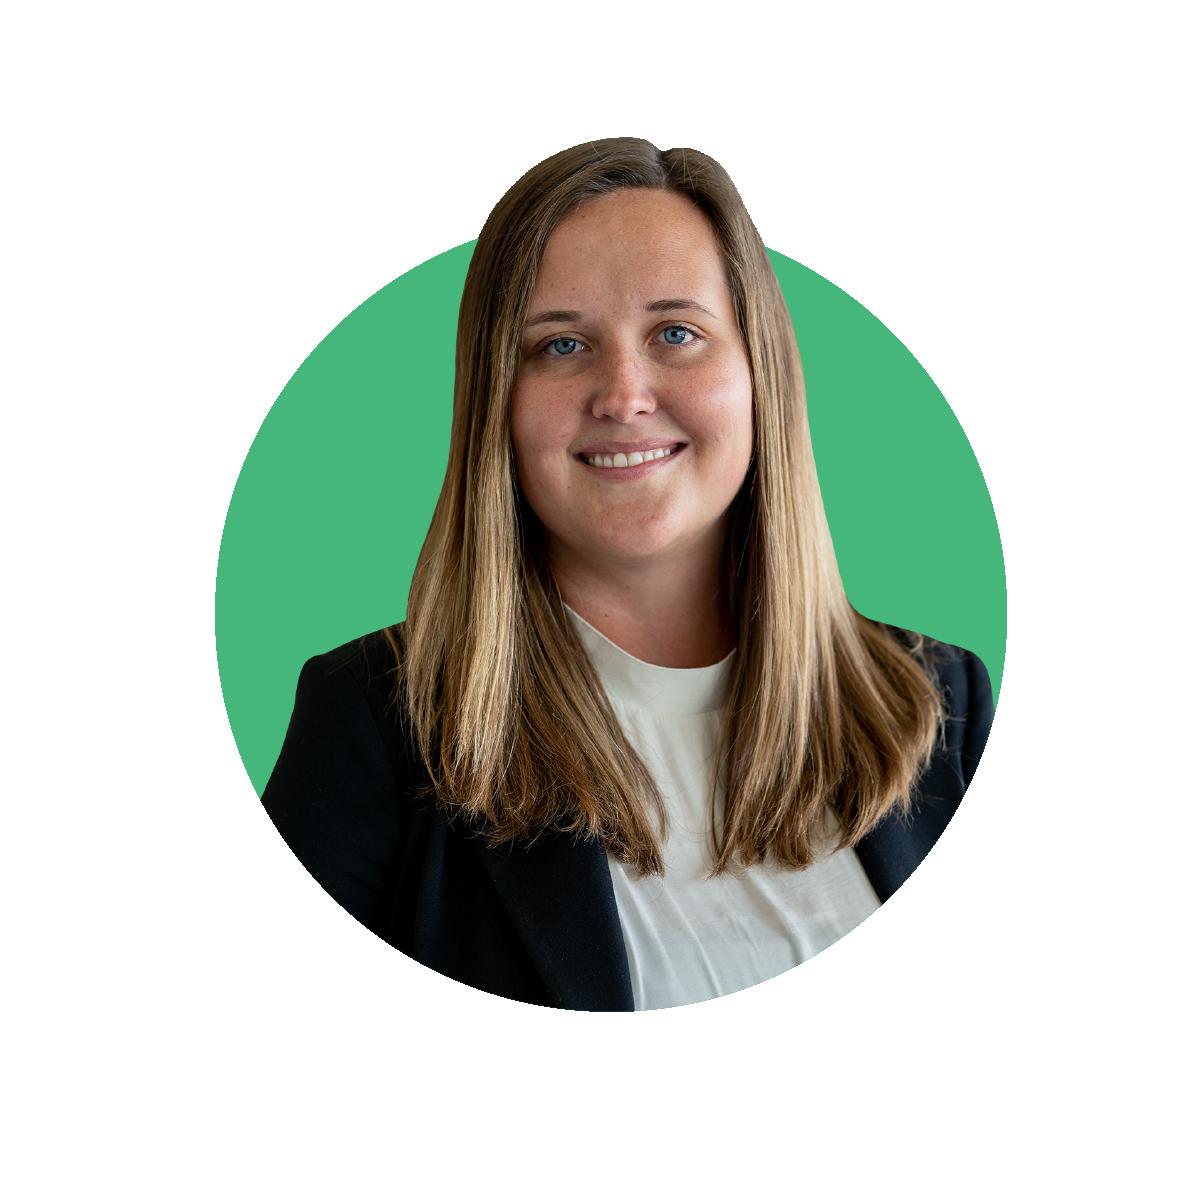 Headshot of Sarah Meyers director of operations at Bankable